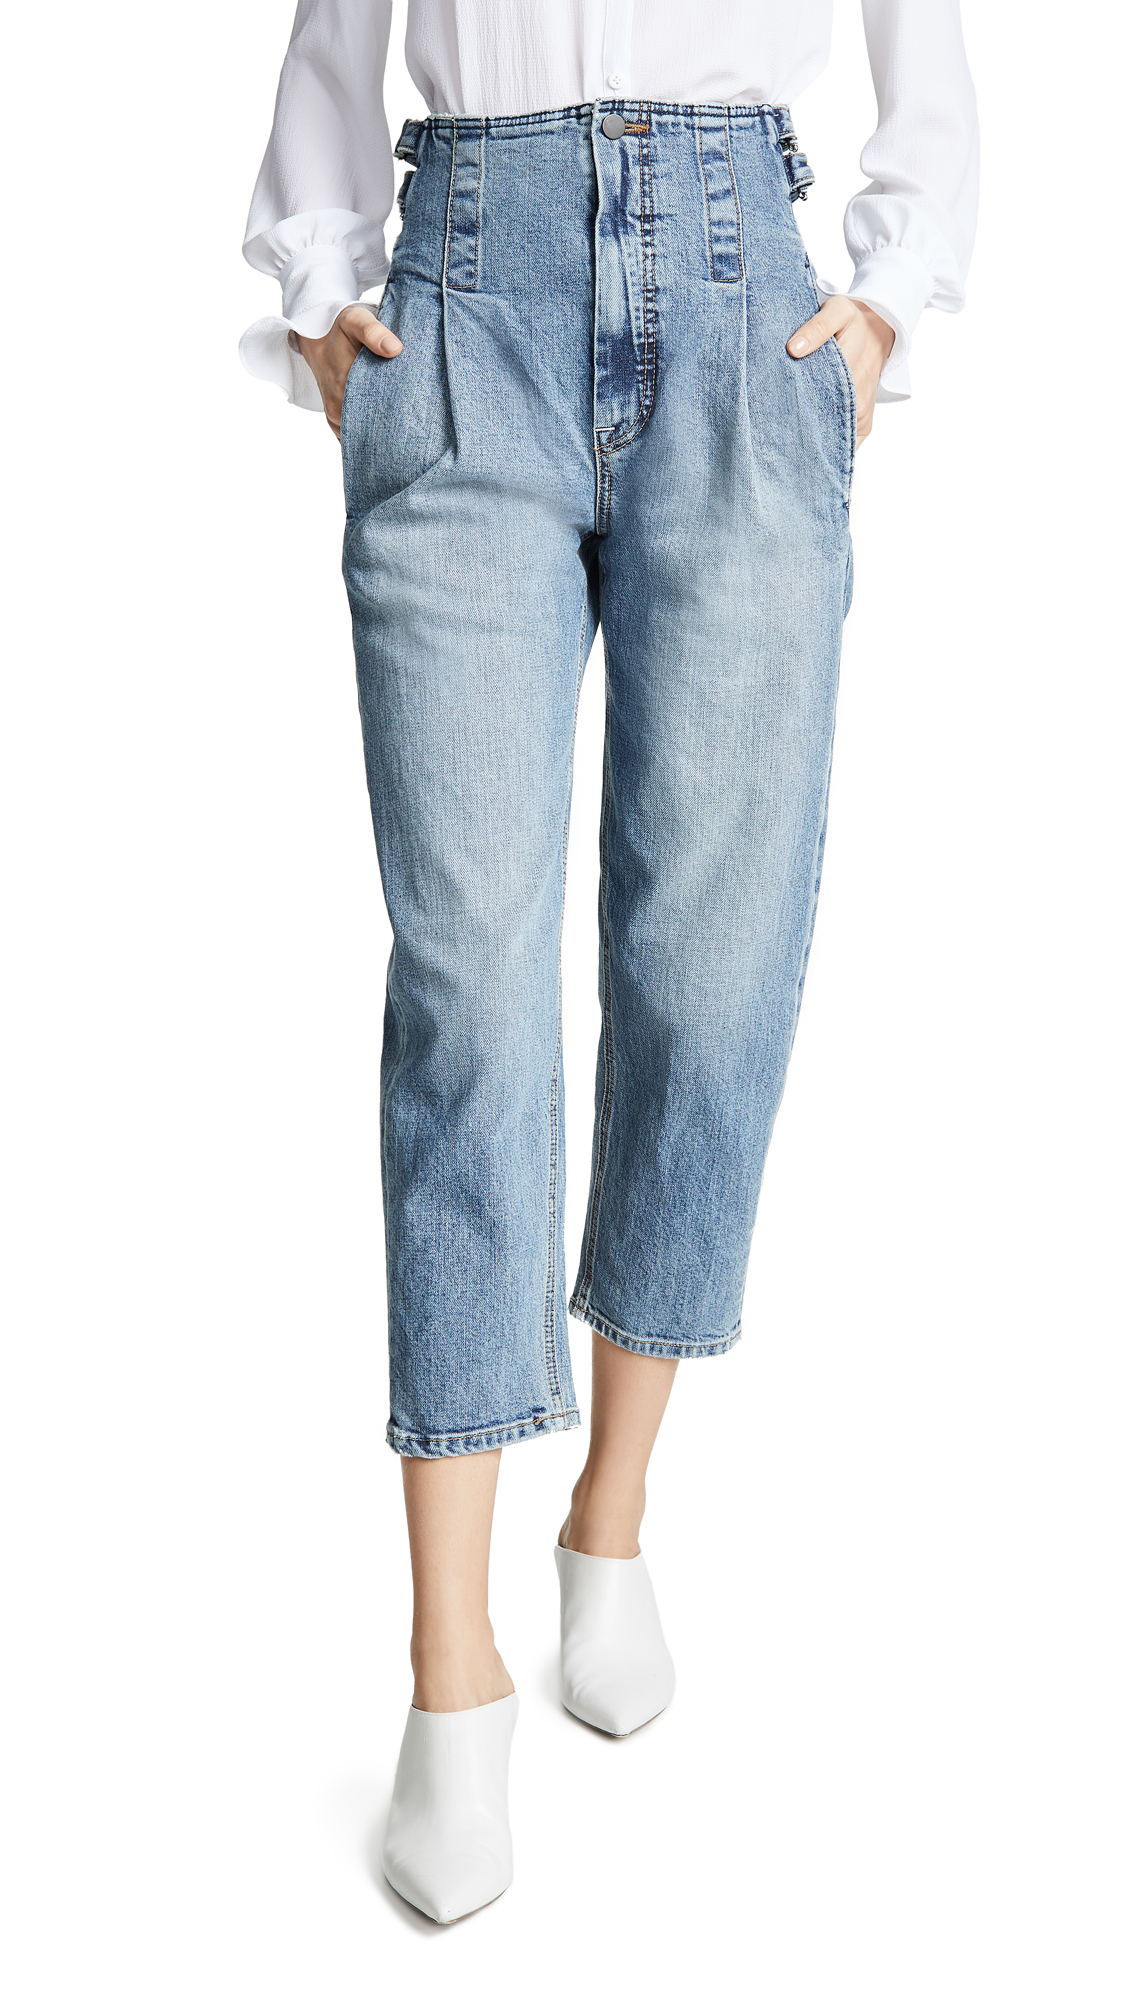 COLOVOS Vintage Buckle Pants in Vintage Blue